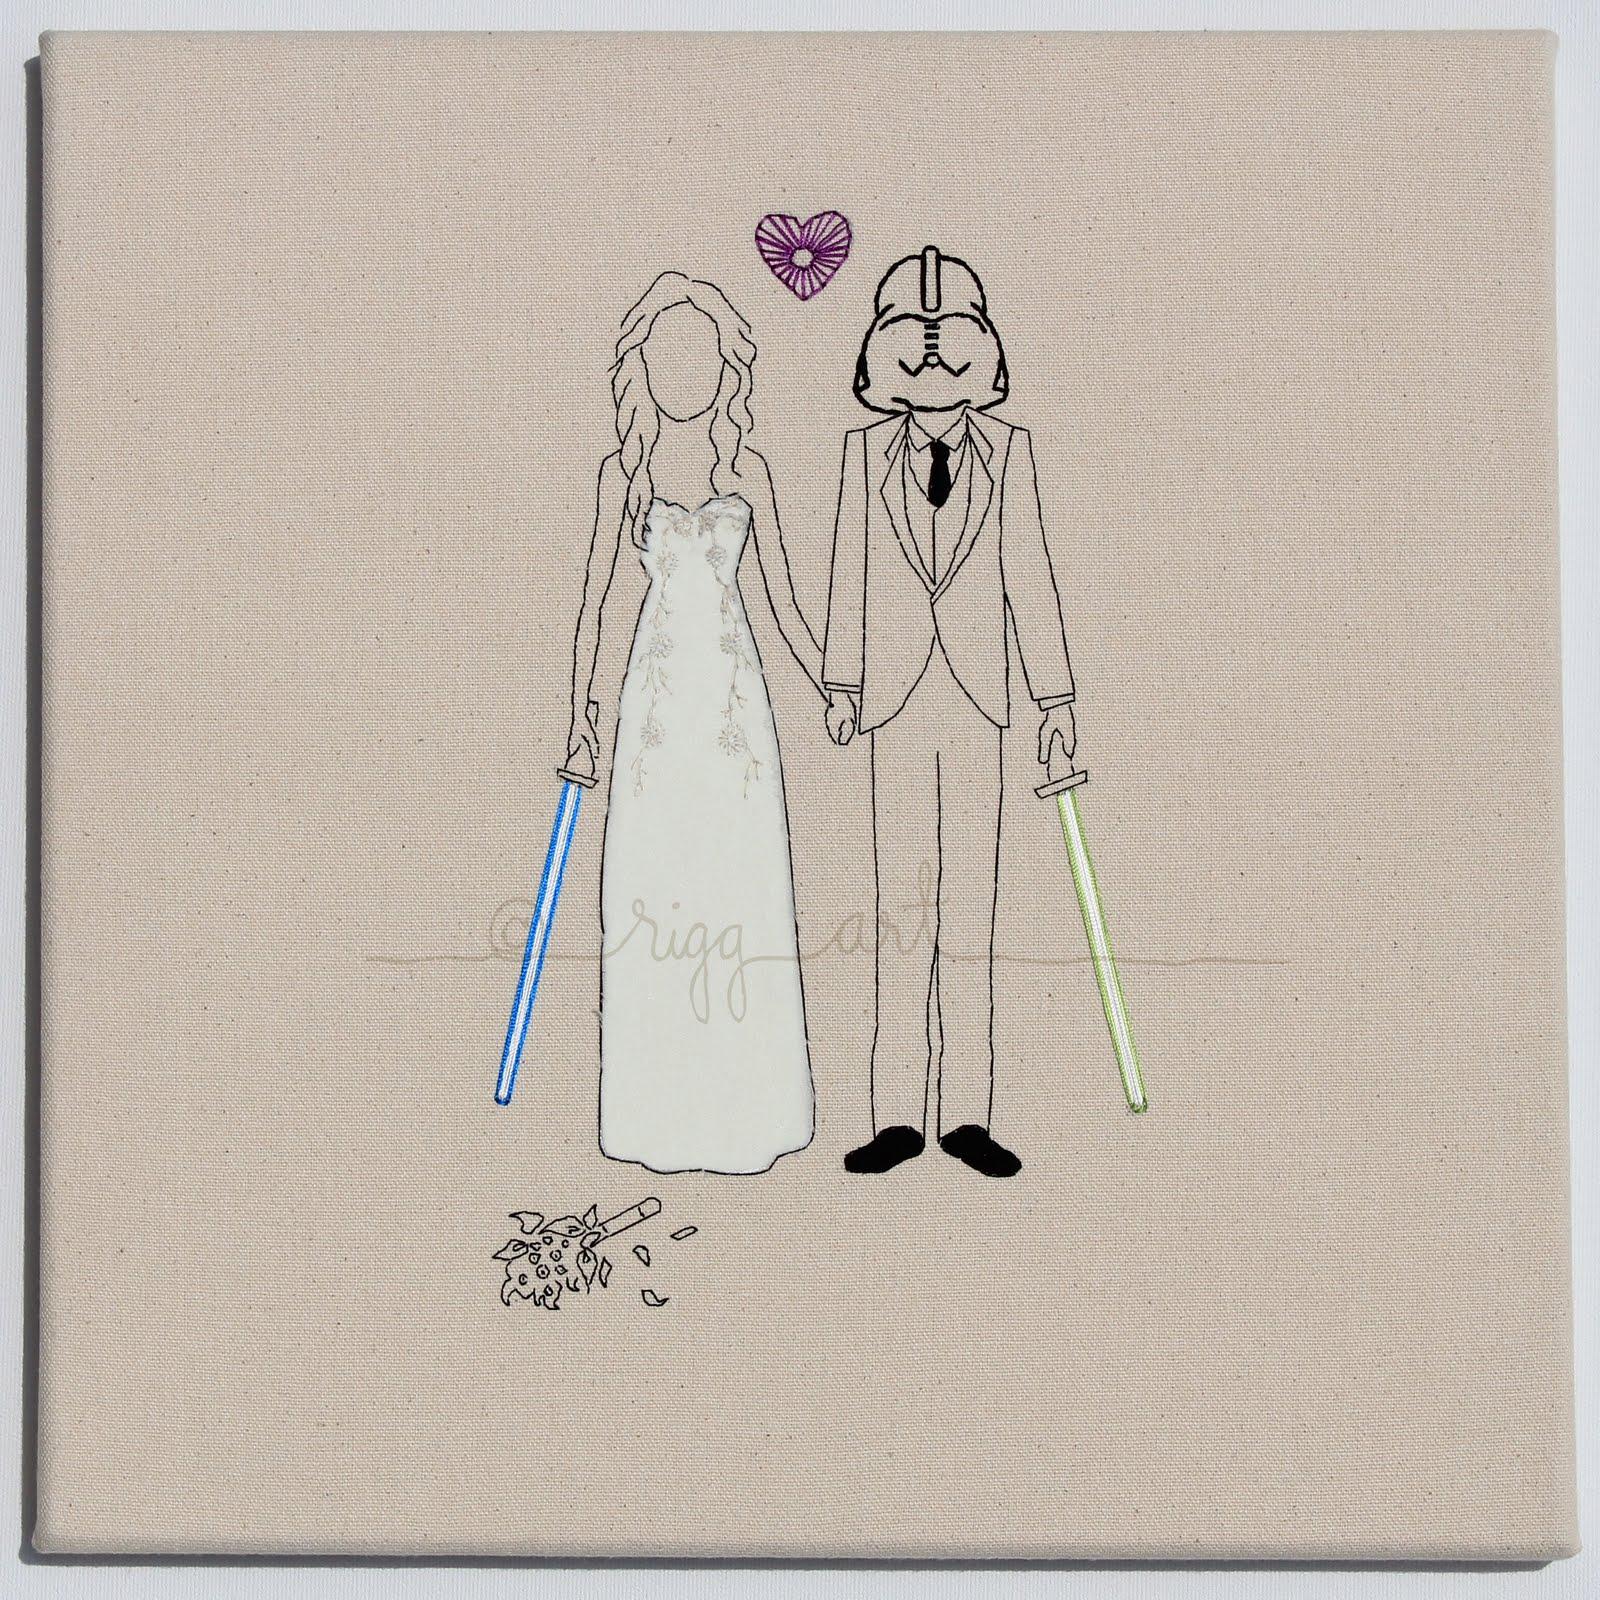 Star Wars Wedding Gifts: Star Wars Bride Groom Wedding Portrait